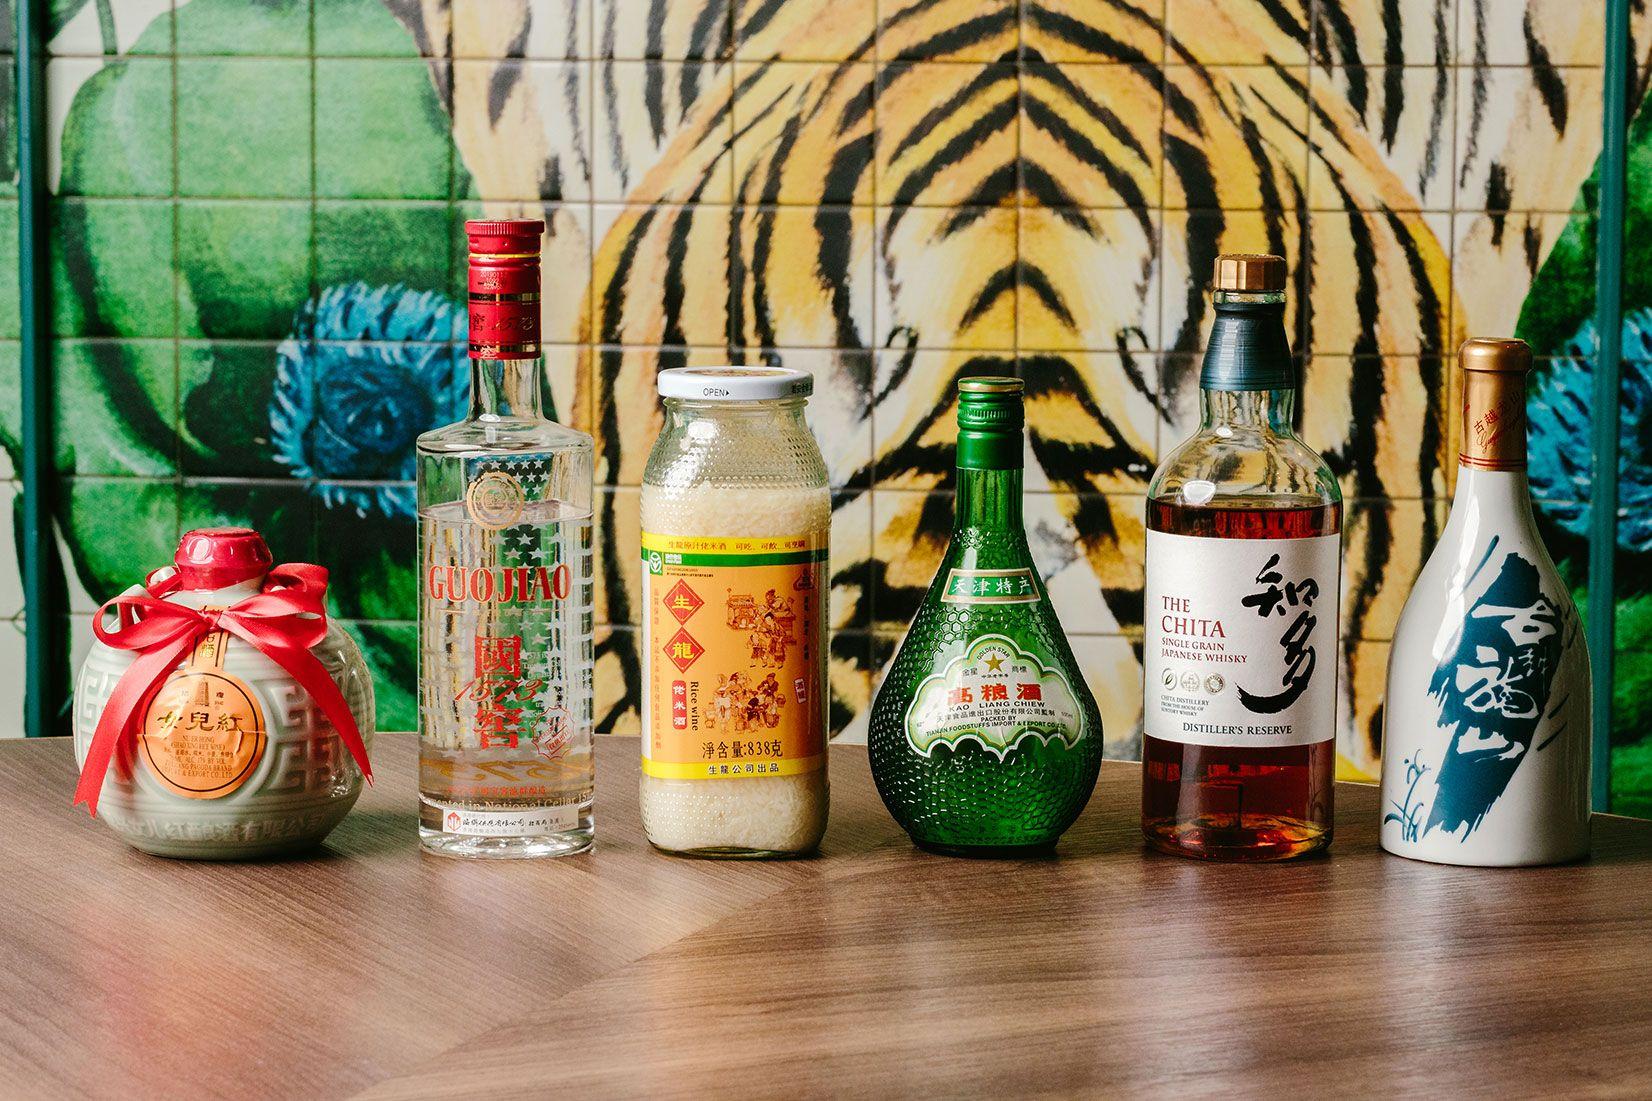 Hong Kong Restaurant News: Duckee's Hangover-Inducing Chinese Liquor Pairing, Naughty New Dishes At Sexy Crab, And More